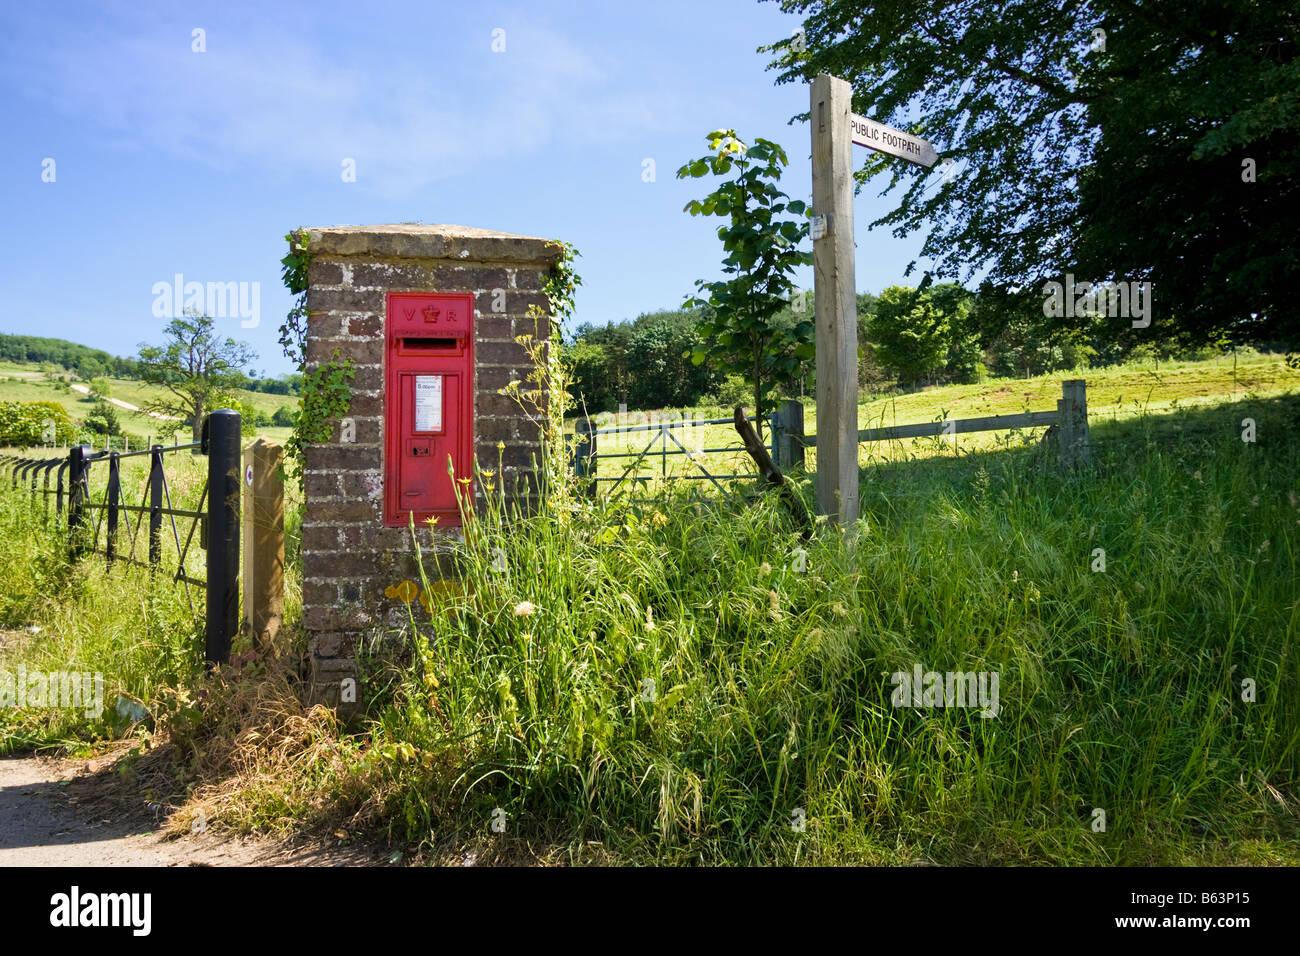 Rural Victorian postbox near Albury in Surrey, England, UK - Stock Image